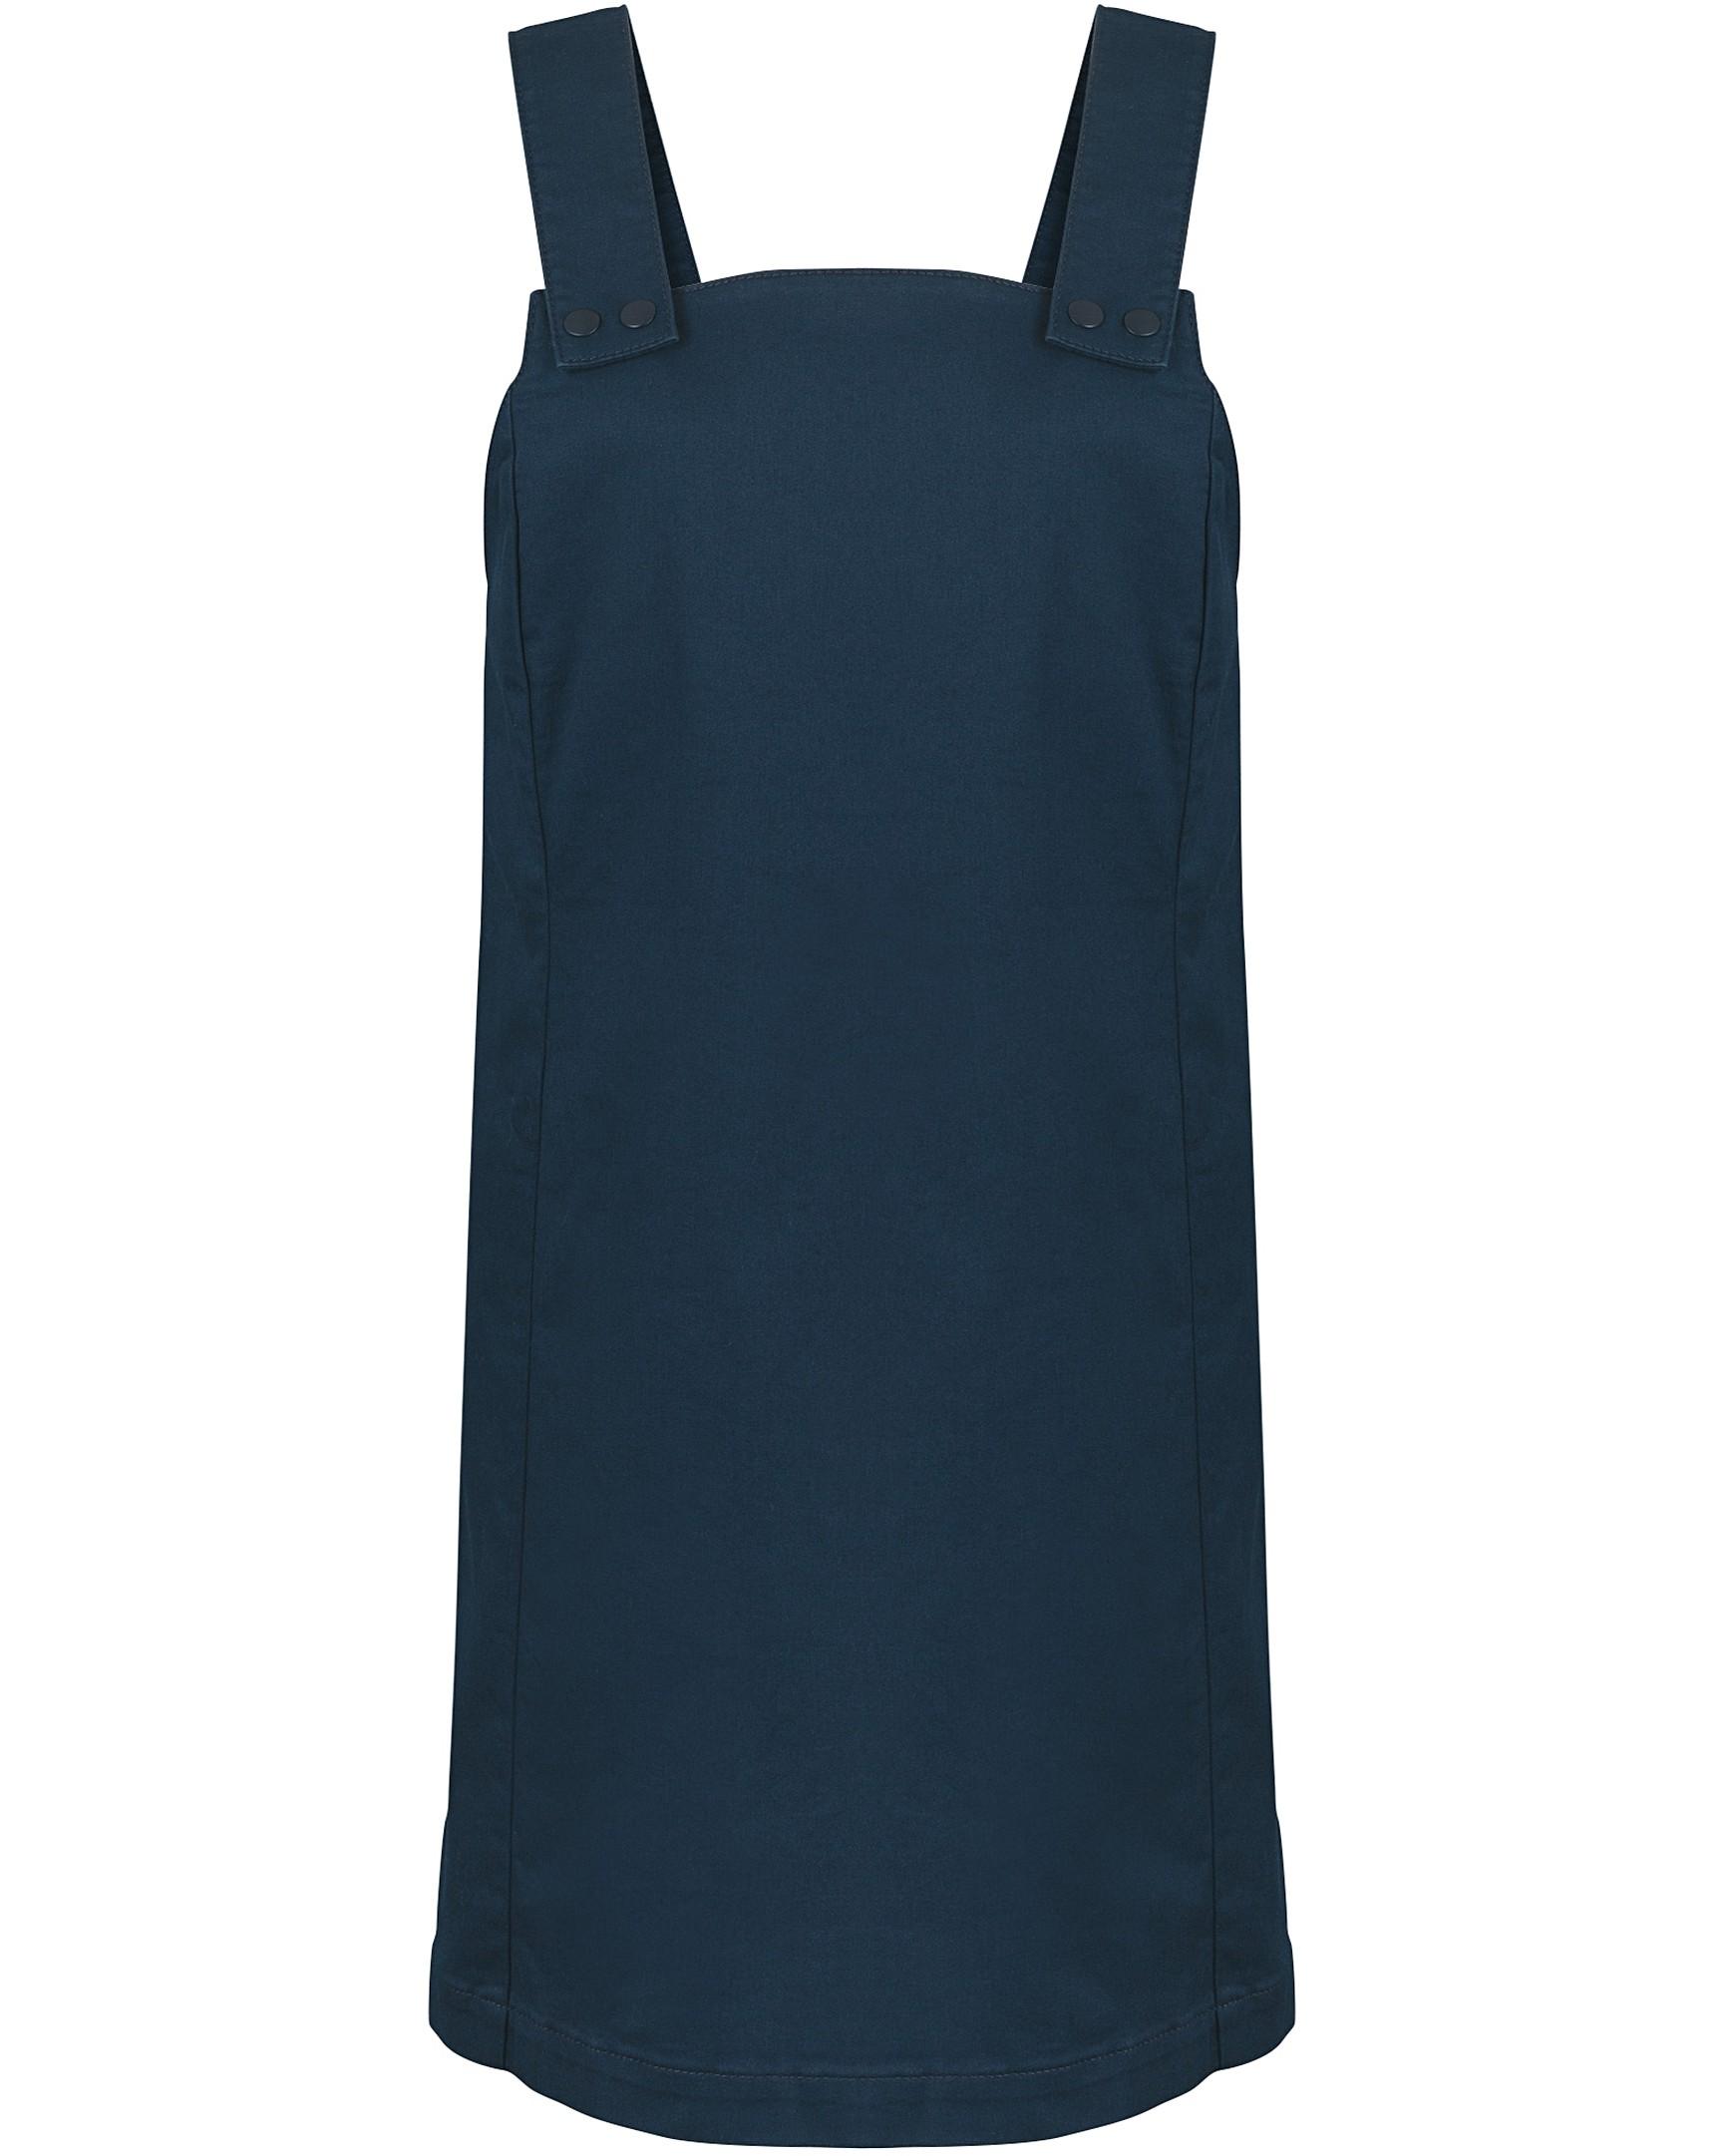 cd1c3f143d9 Popper Front Navy Pinafore Dress